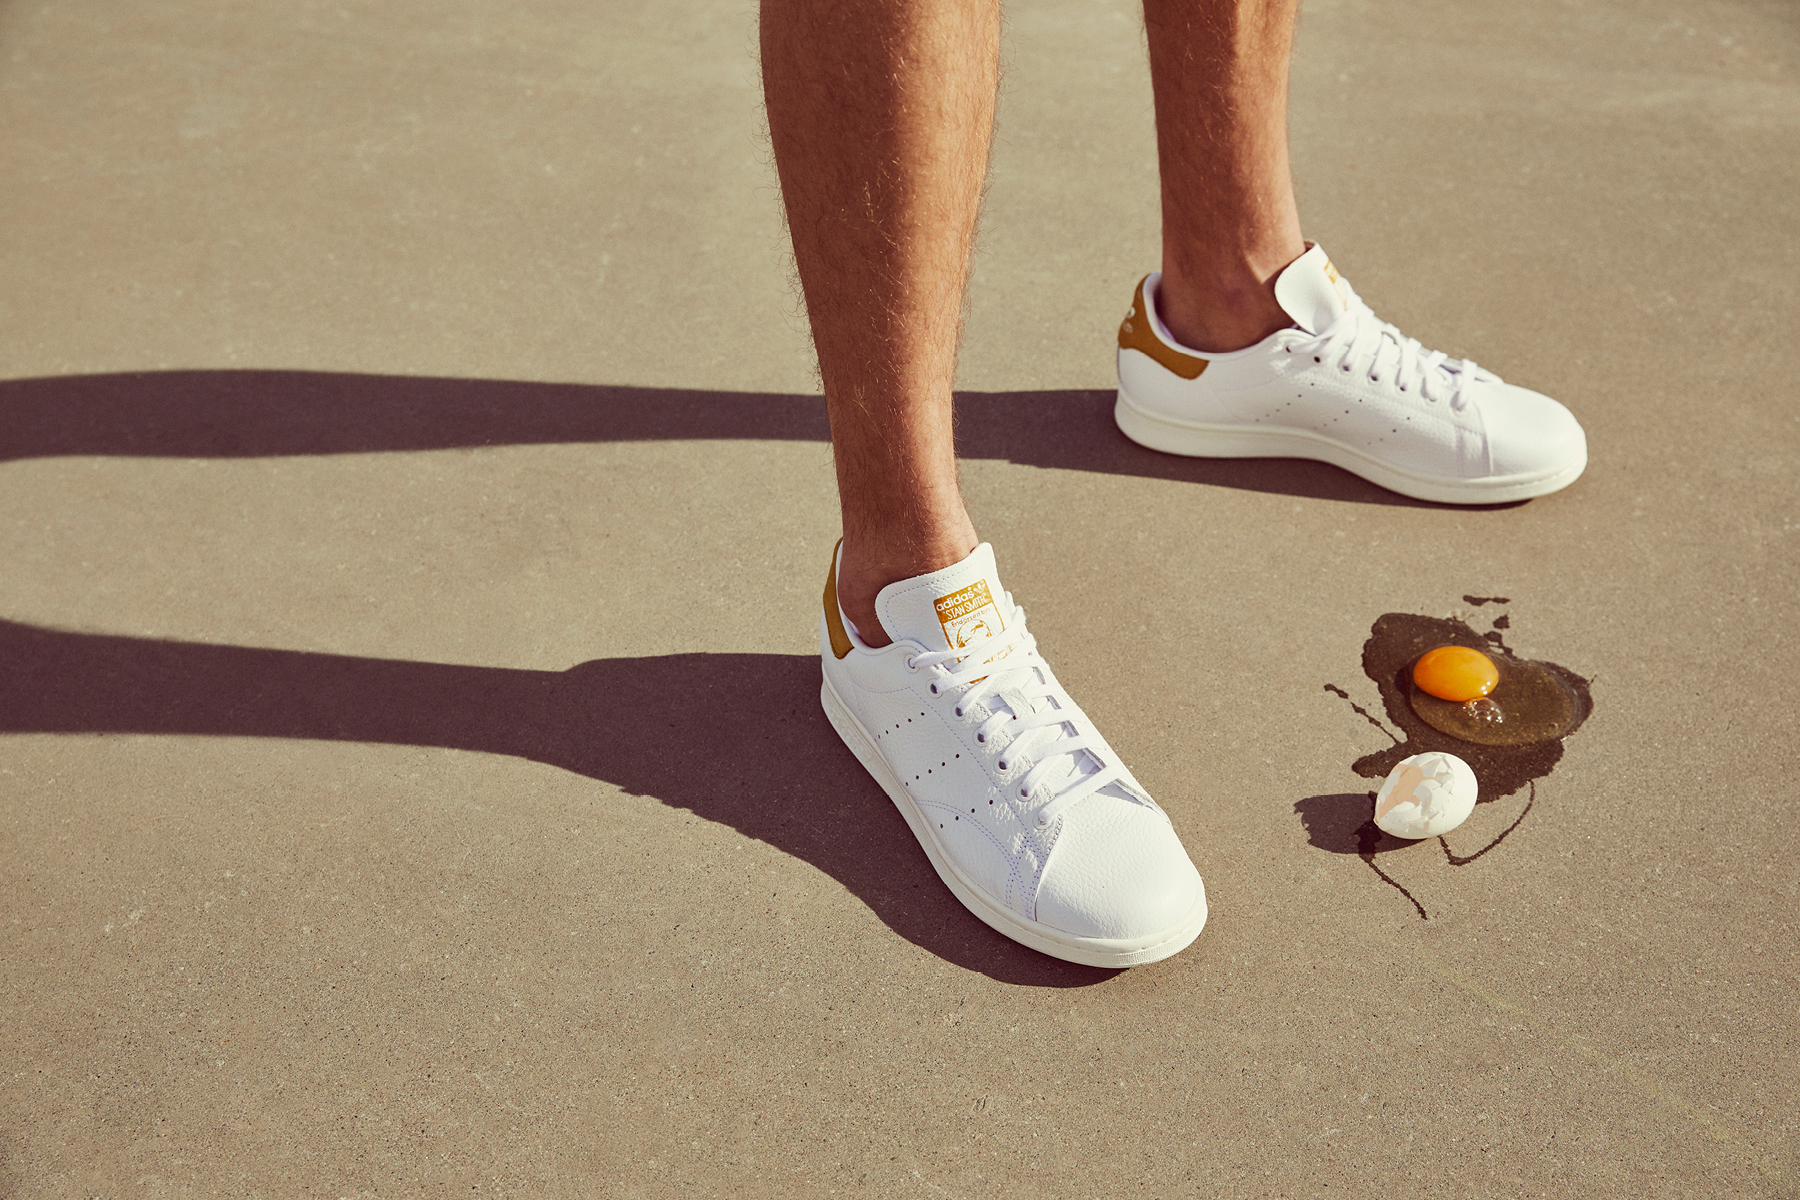 Egg x Adidas